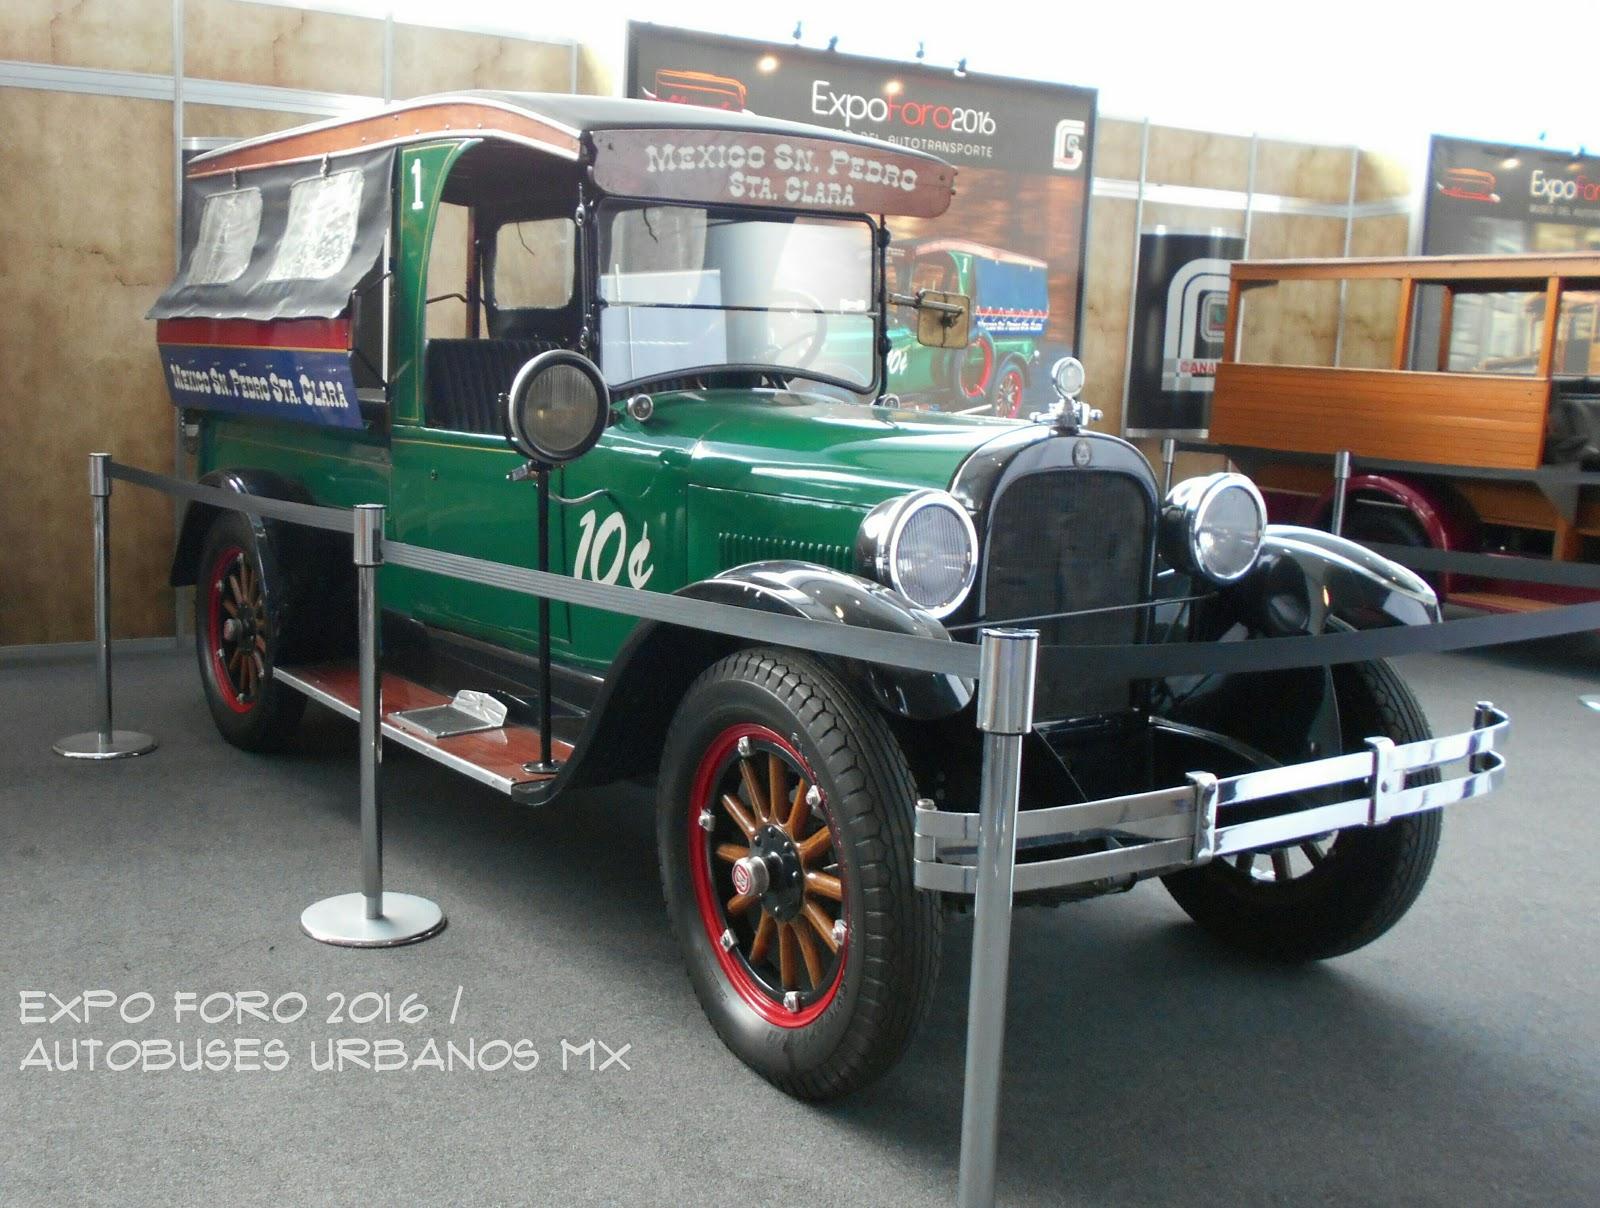 1600 Sf To Sm Autobuses Urbanos Ciudad De M 233 Xico 1923 Autob 250 S Ford